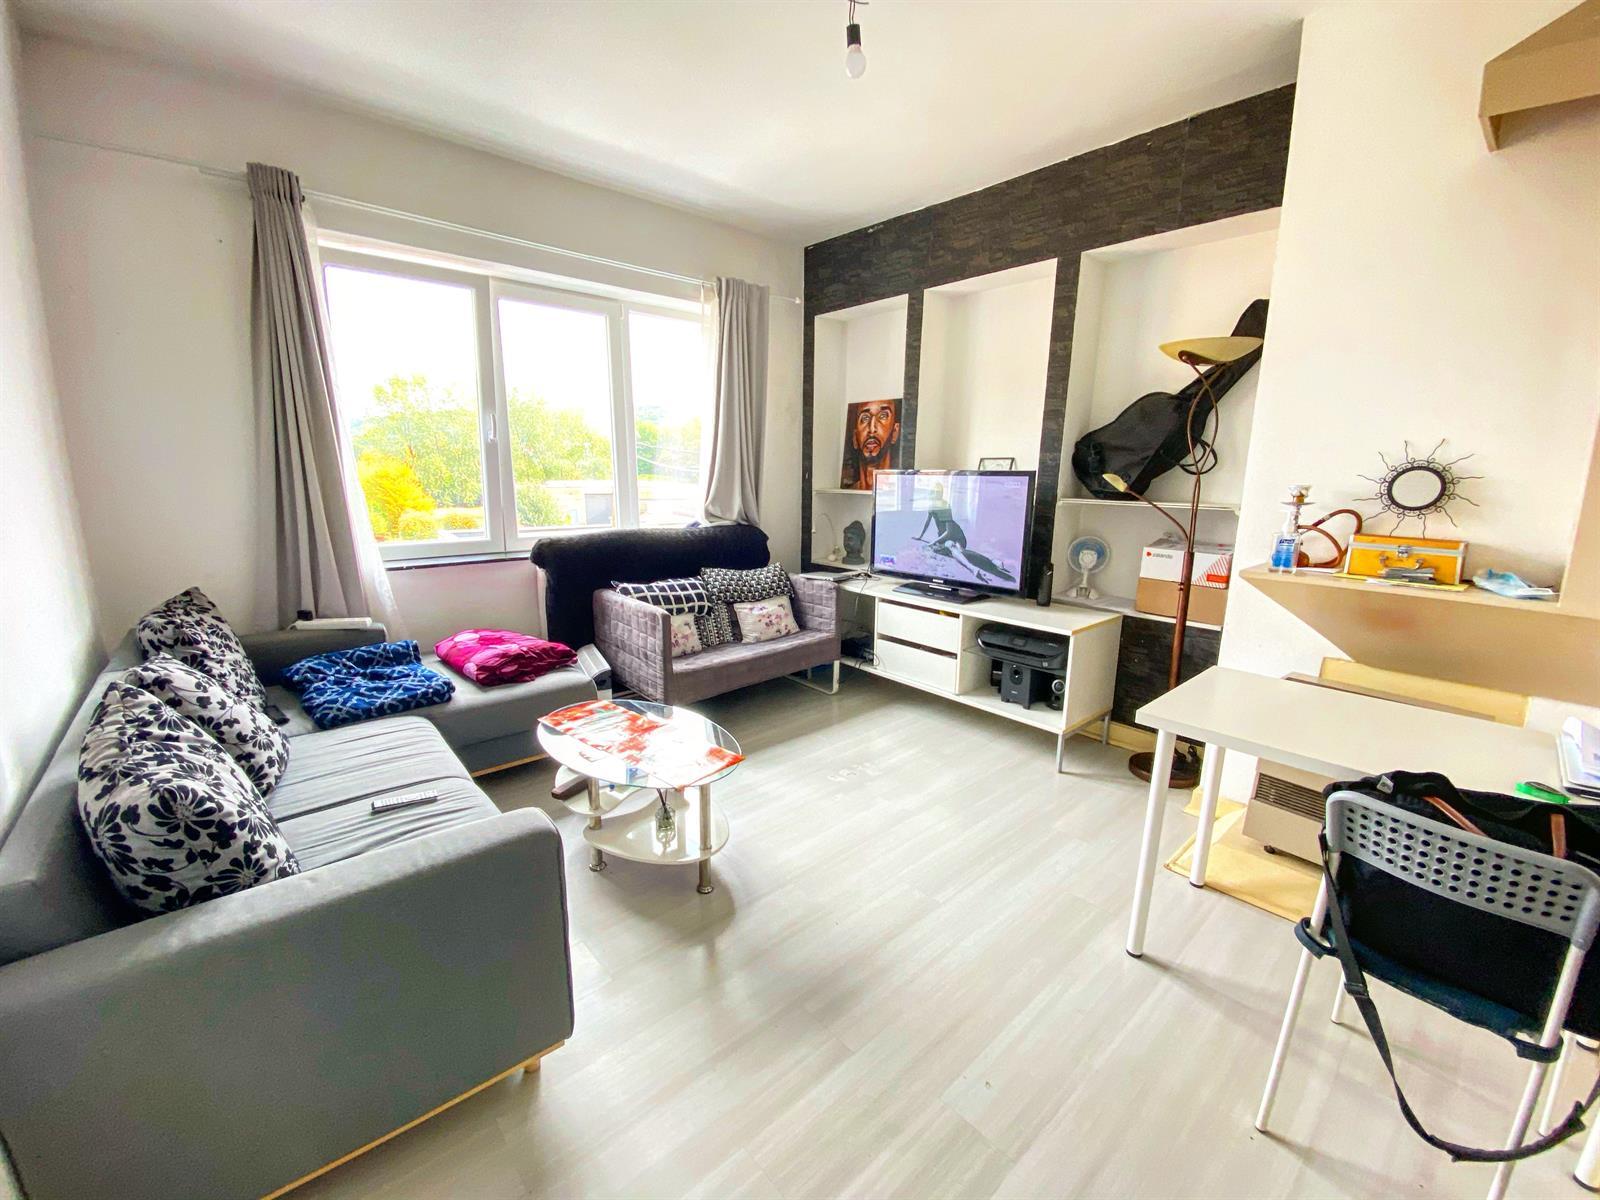 Apartment block  - Liege - #4182637-2